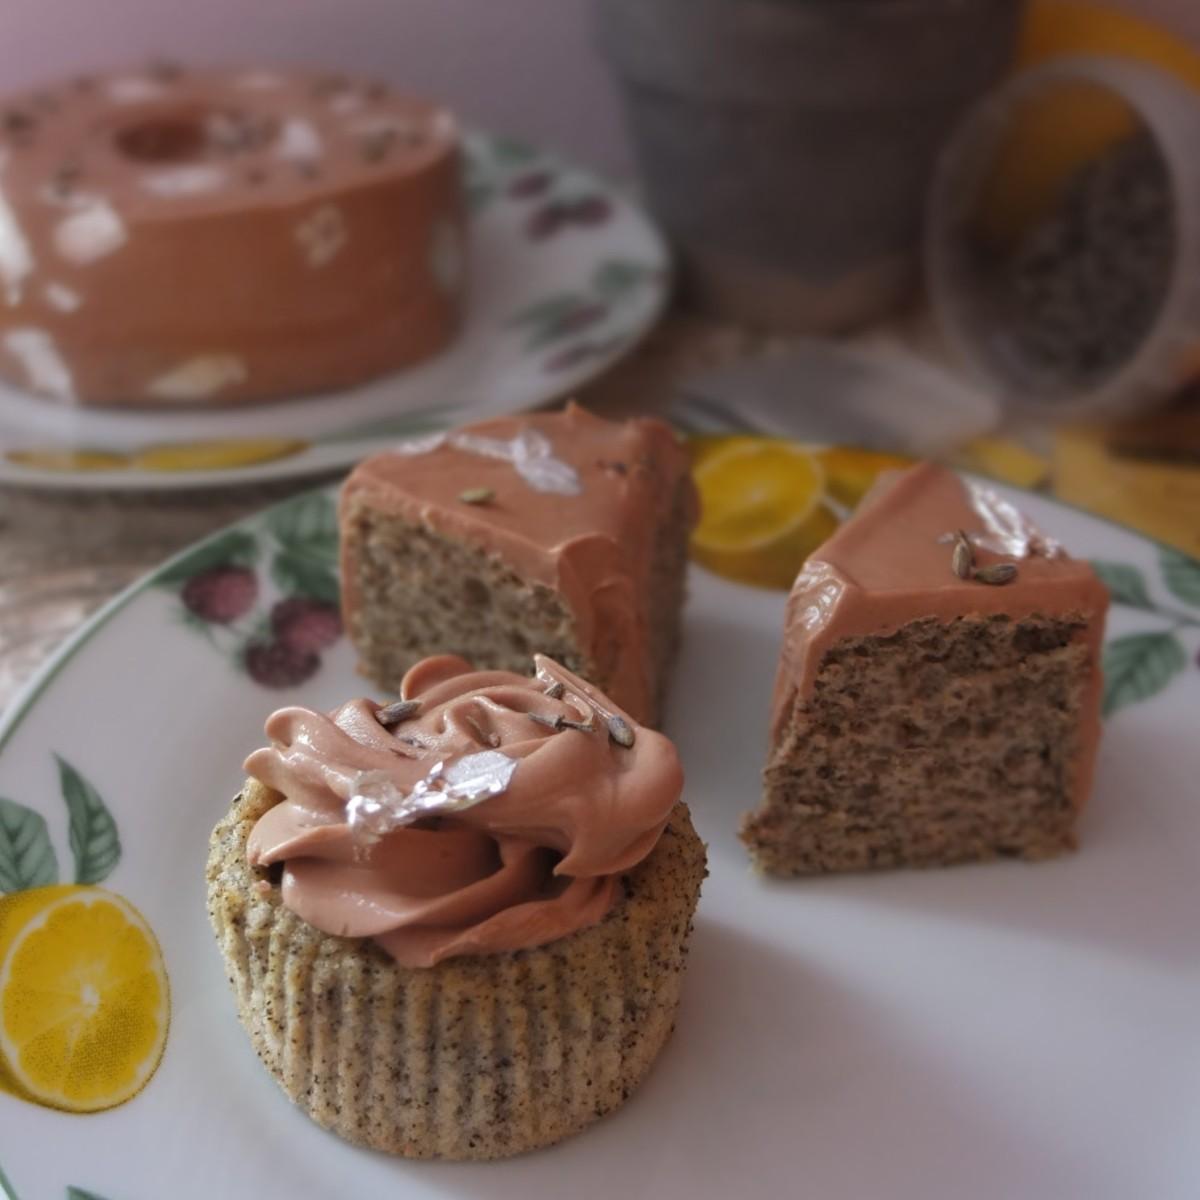 Lavender Infused Chiffon Cake With Lemon Curd Glaze